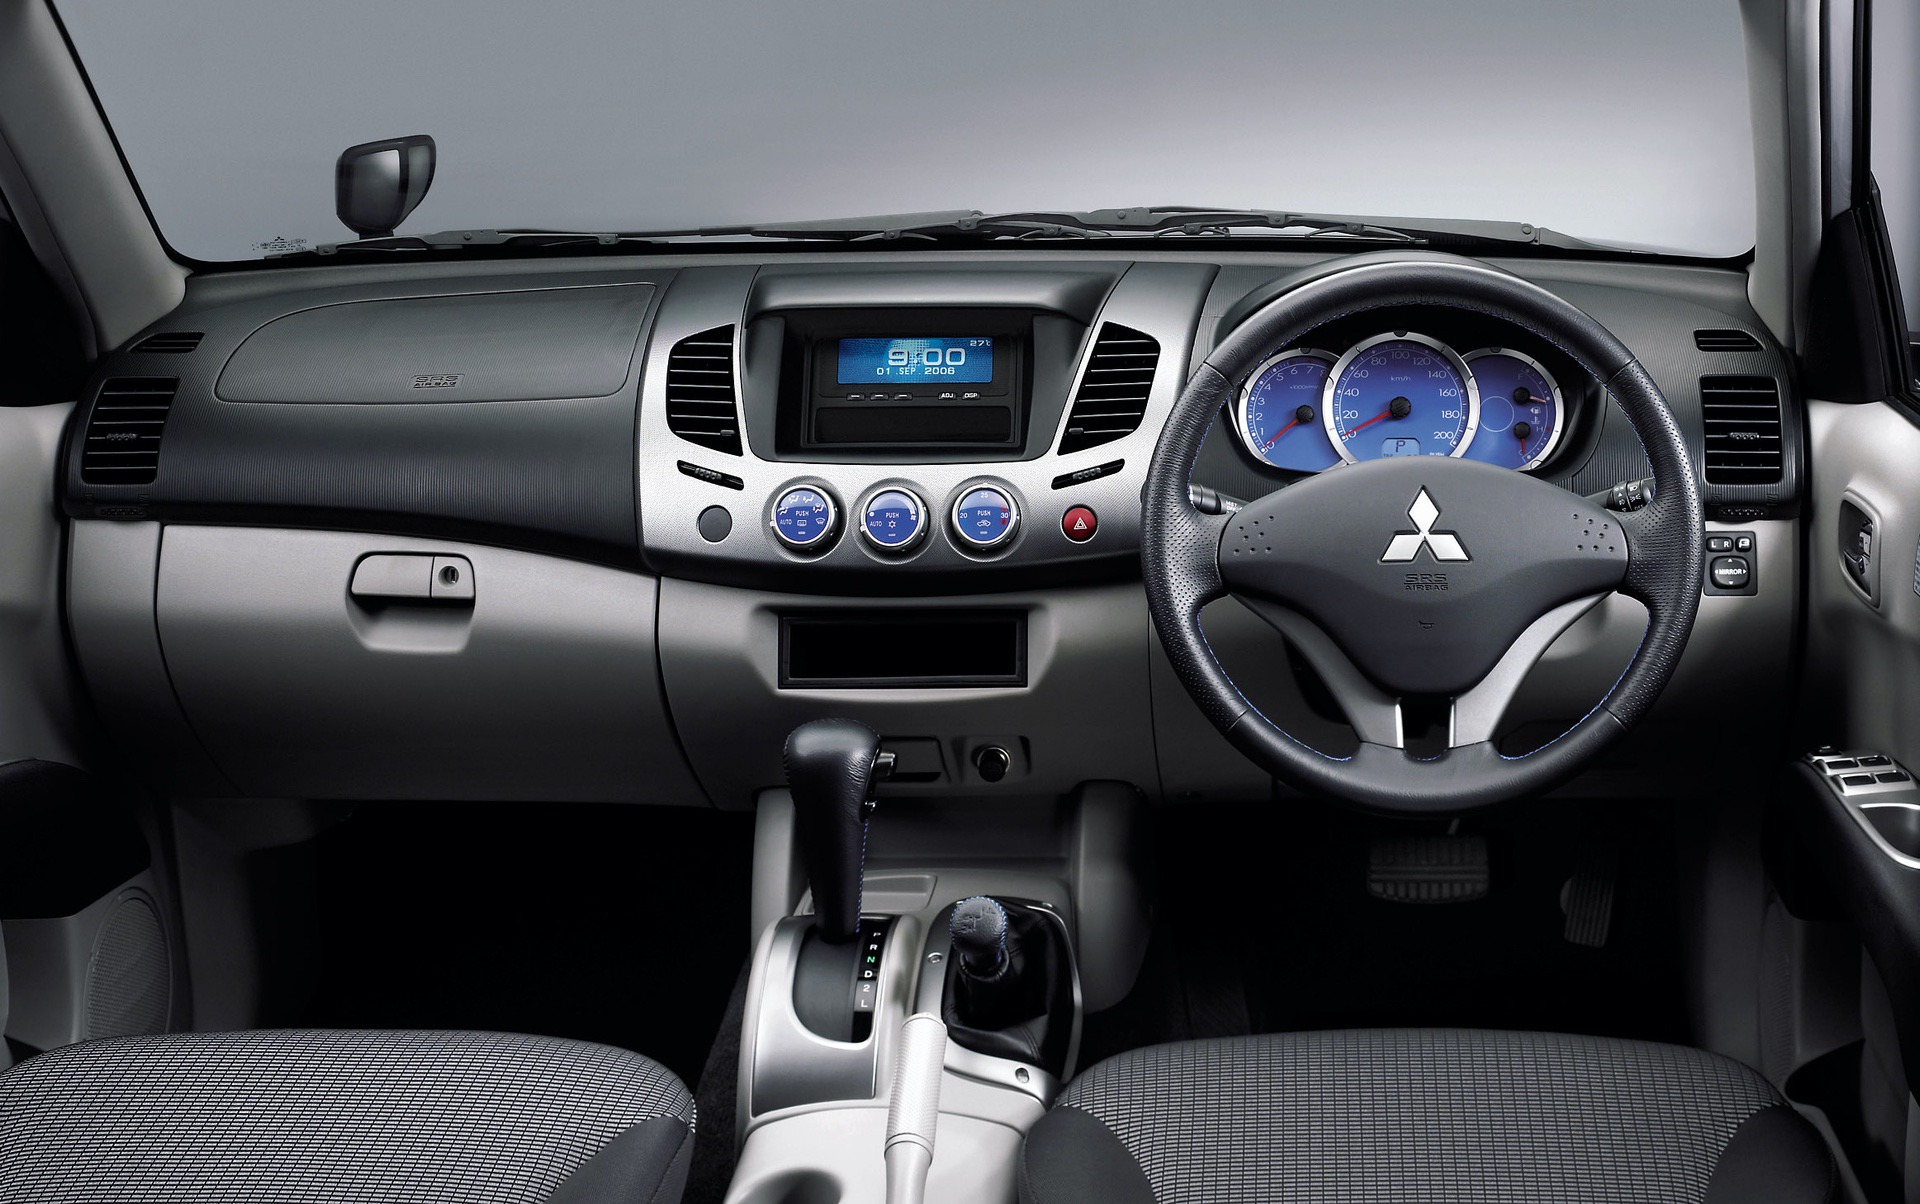 First_Drive_Mitsubishi_L200_0223